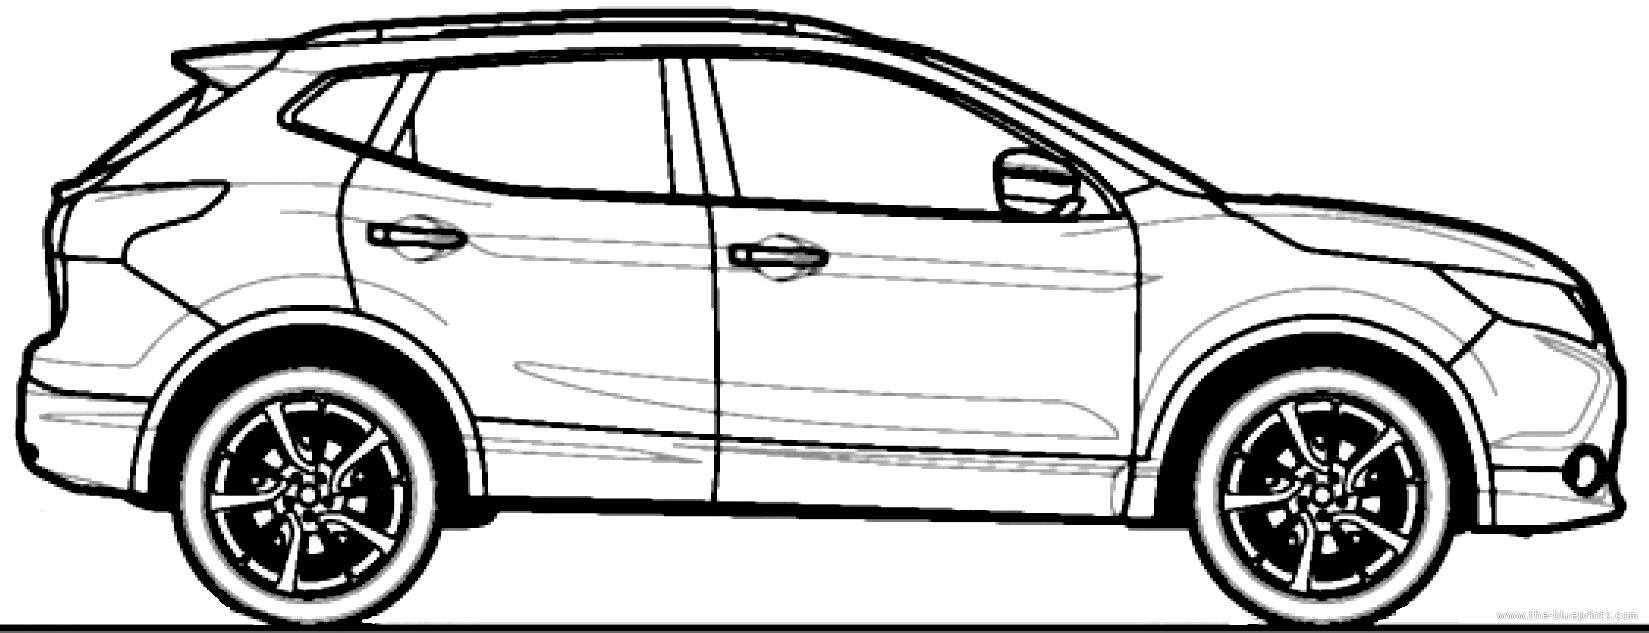 Qashqai Dimensions The Blueprints Cars Nissan Nissan